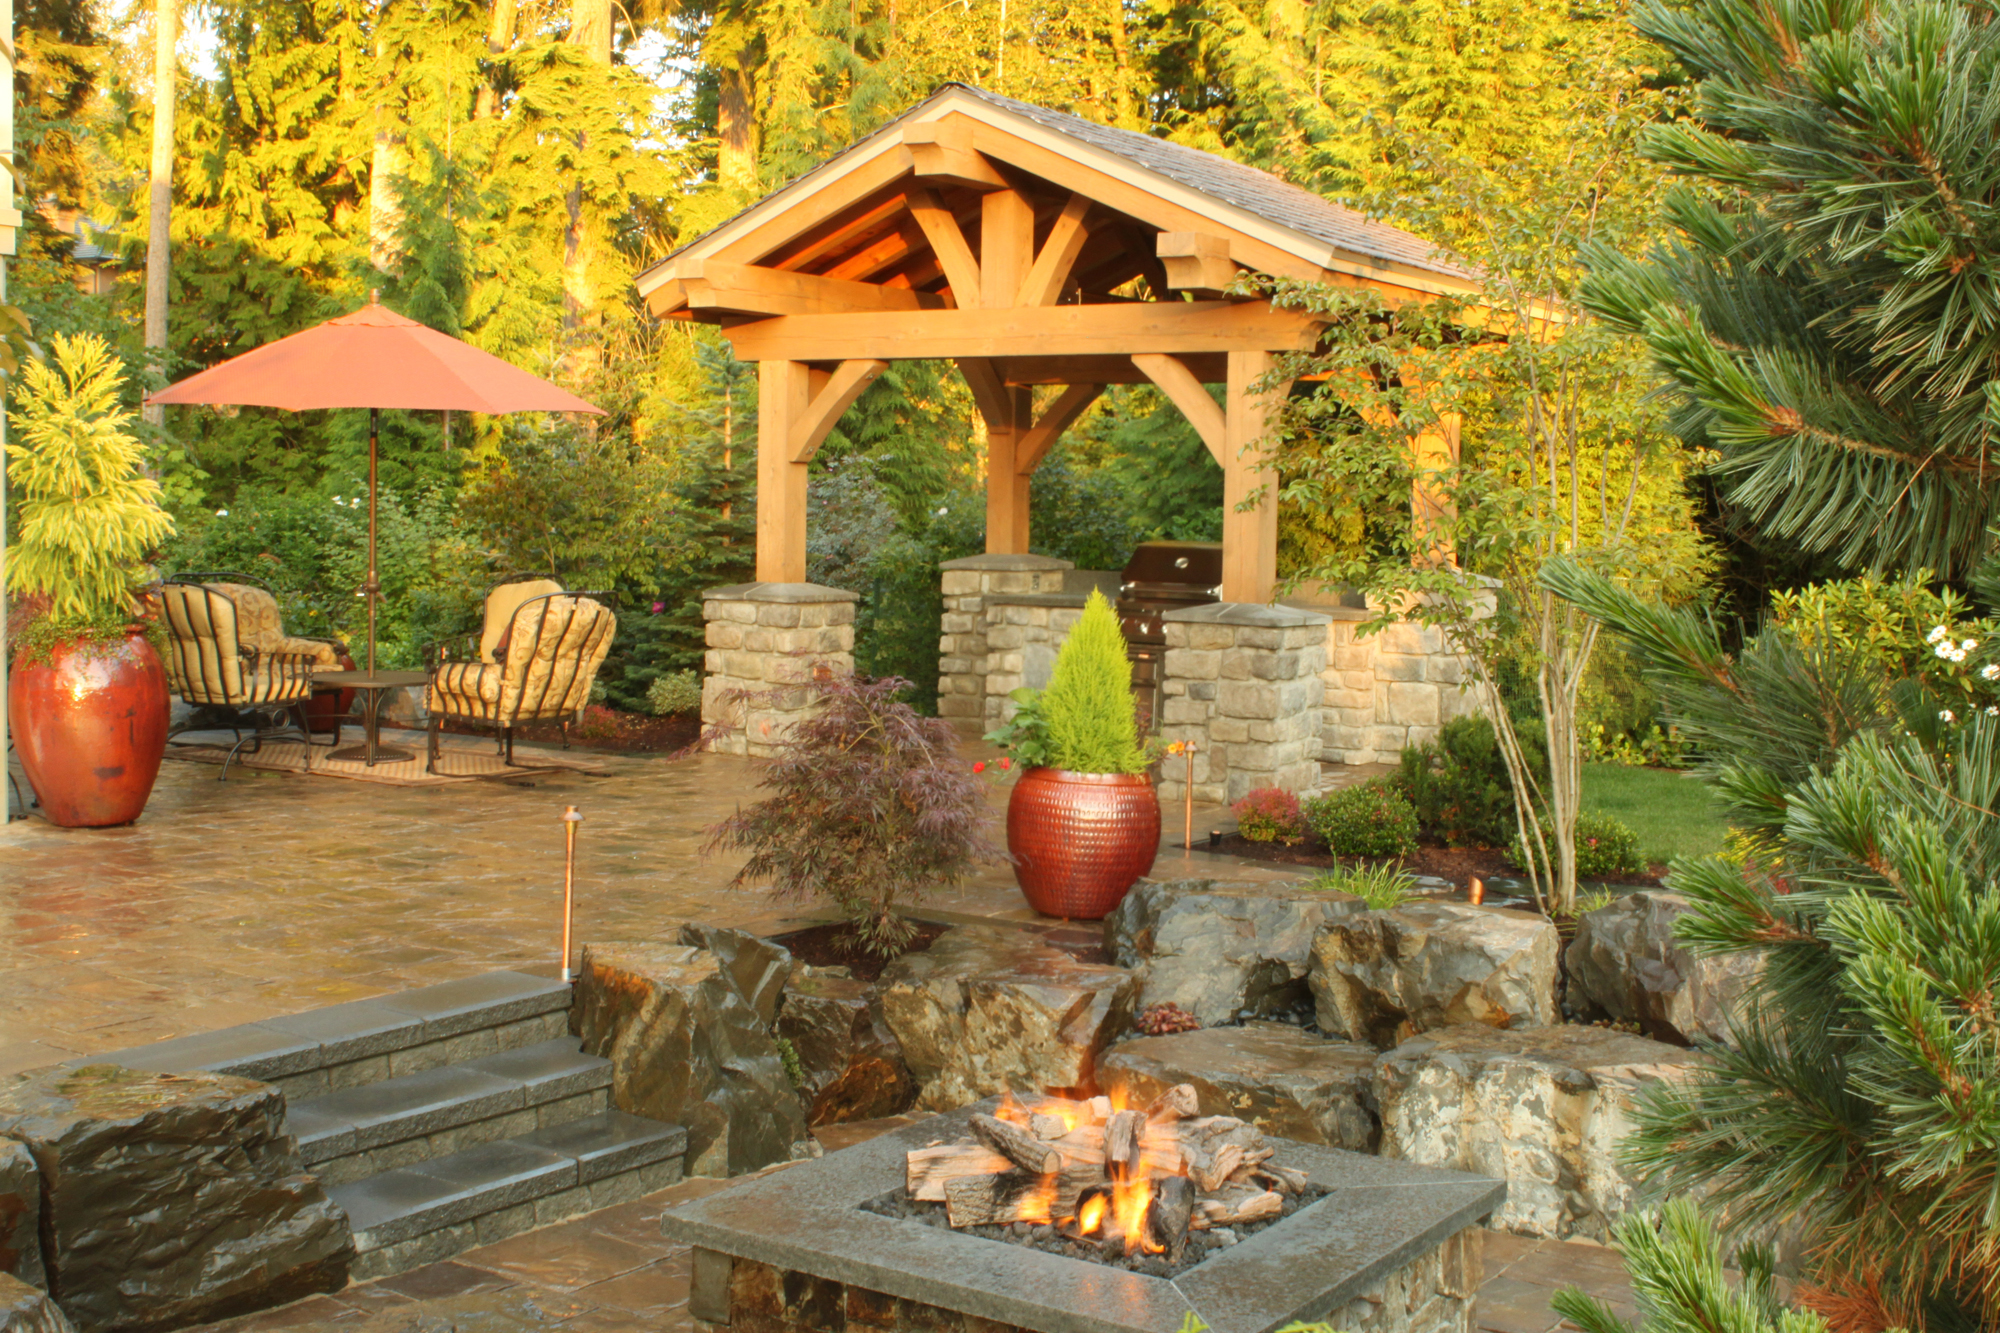 Custom Outdoor Room W/ Outdoor Kitchen & Fire Pit